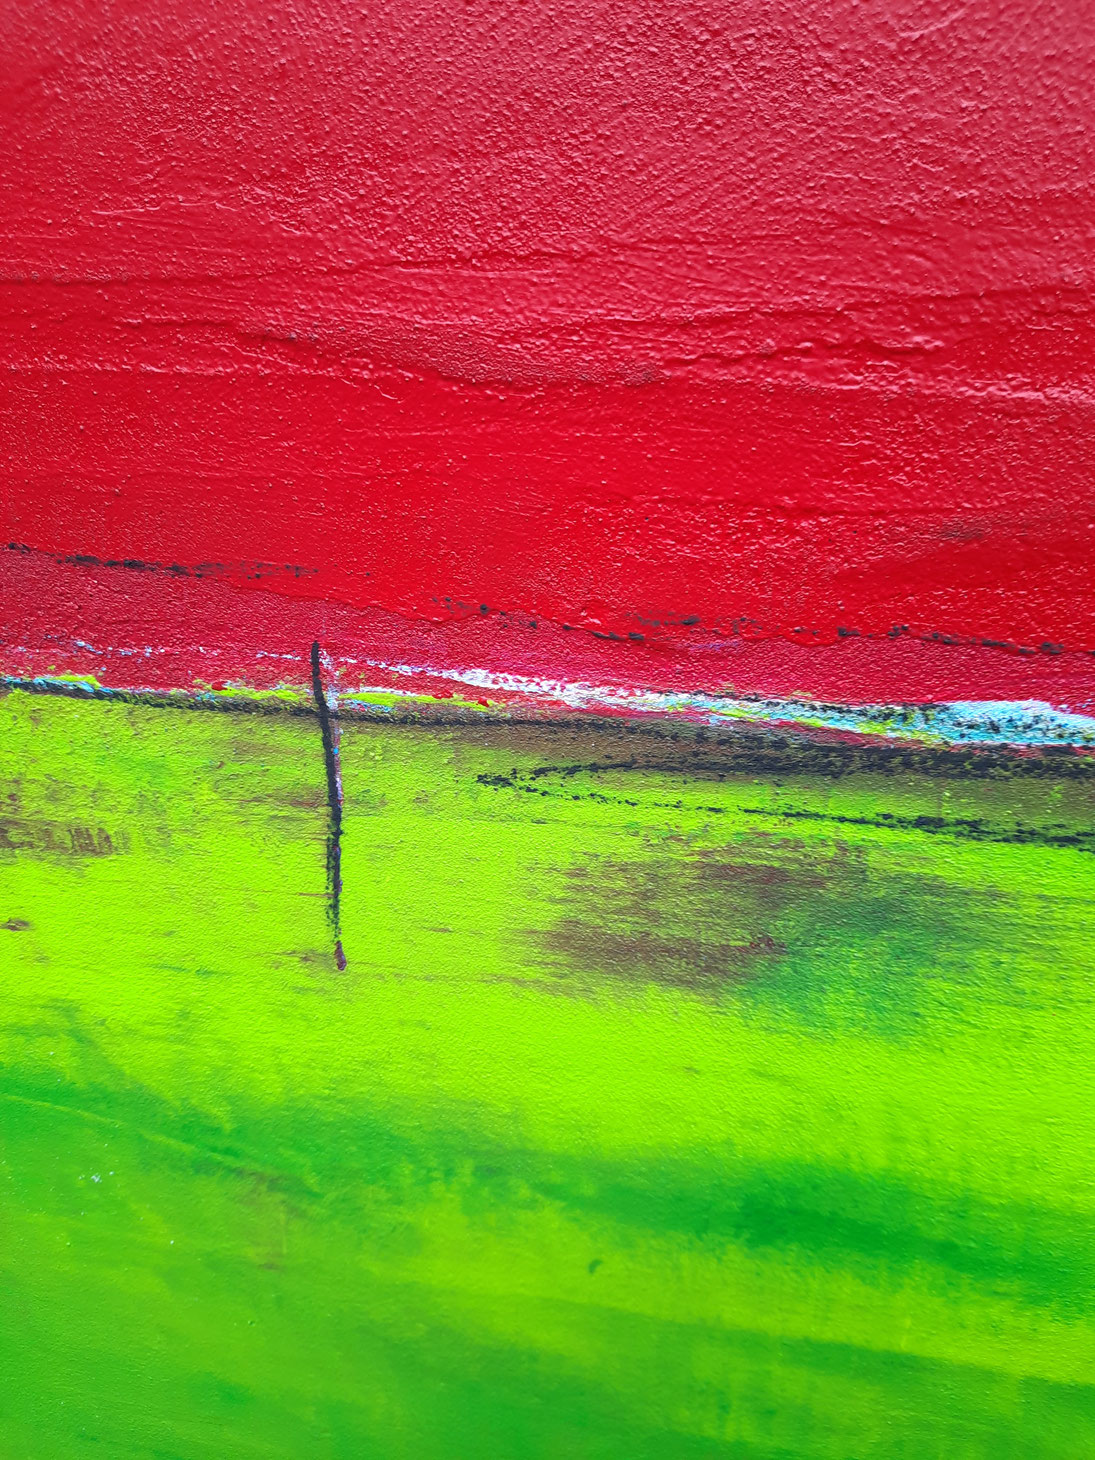 landschaftsbild -grün, rot